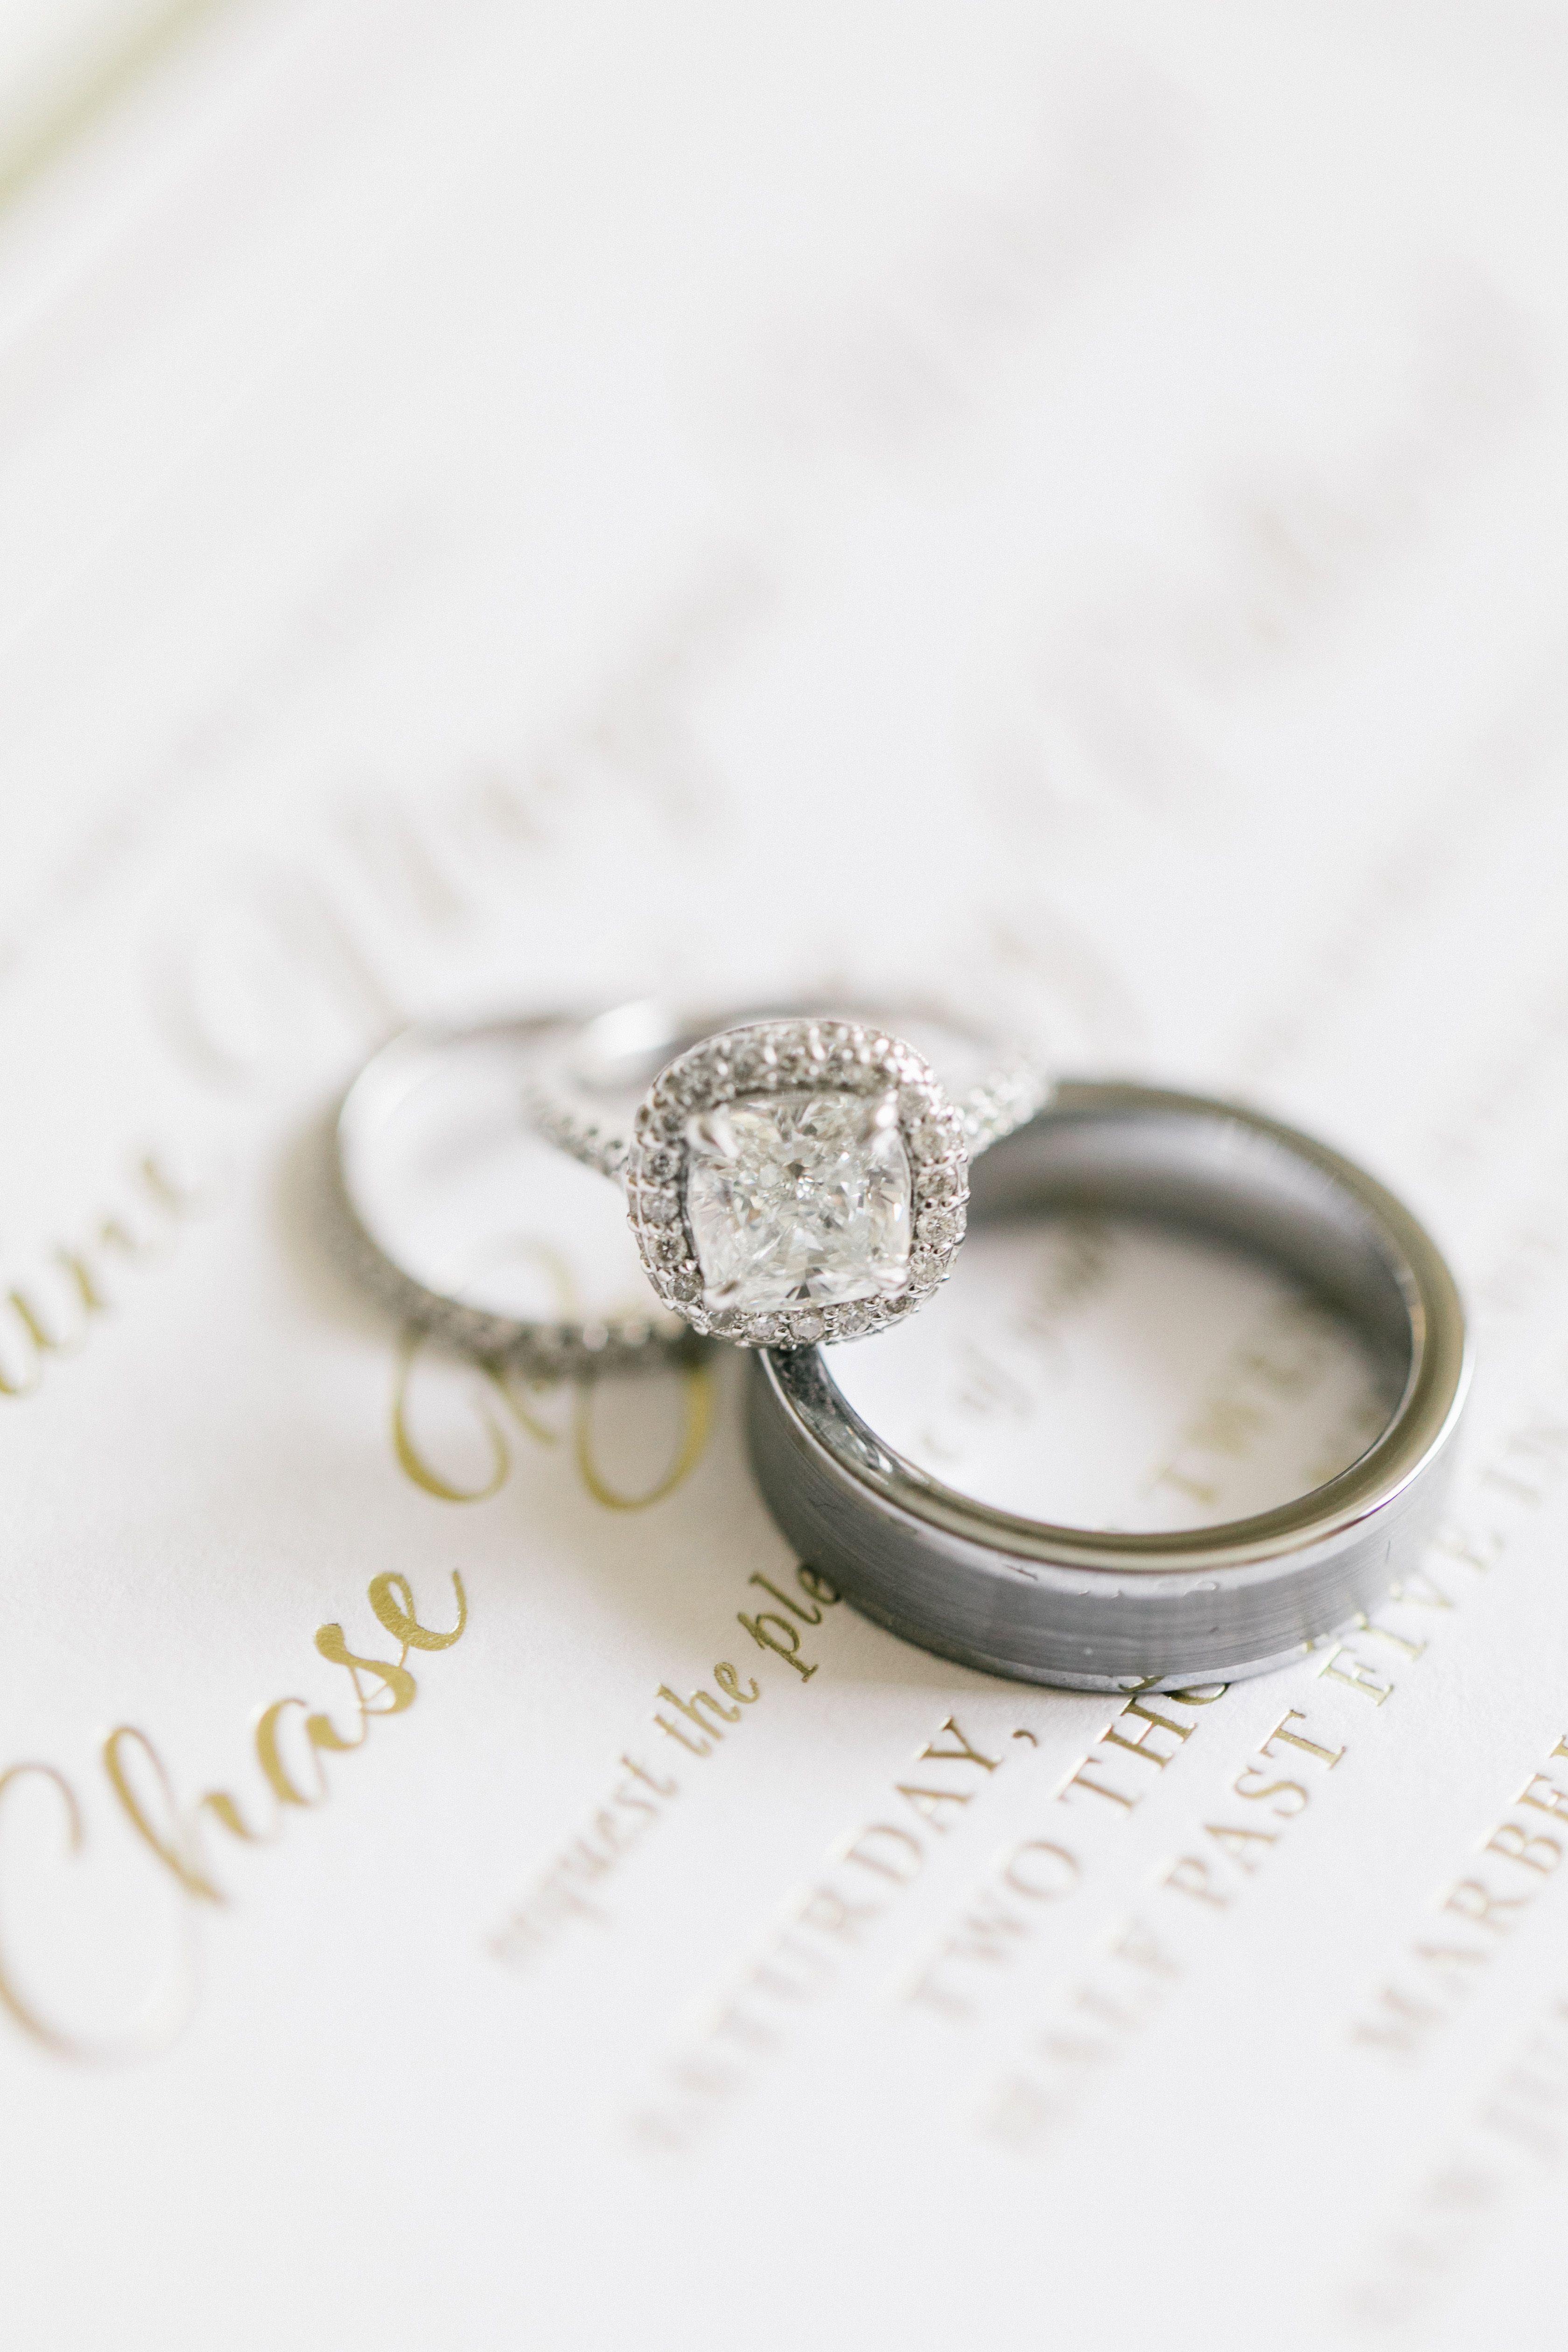 Gorgeous Ring Photography The Grovers Vintageweddingrings: Gorgeous Simple Wedding Rings At Reisefeber.org